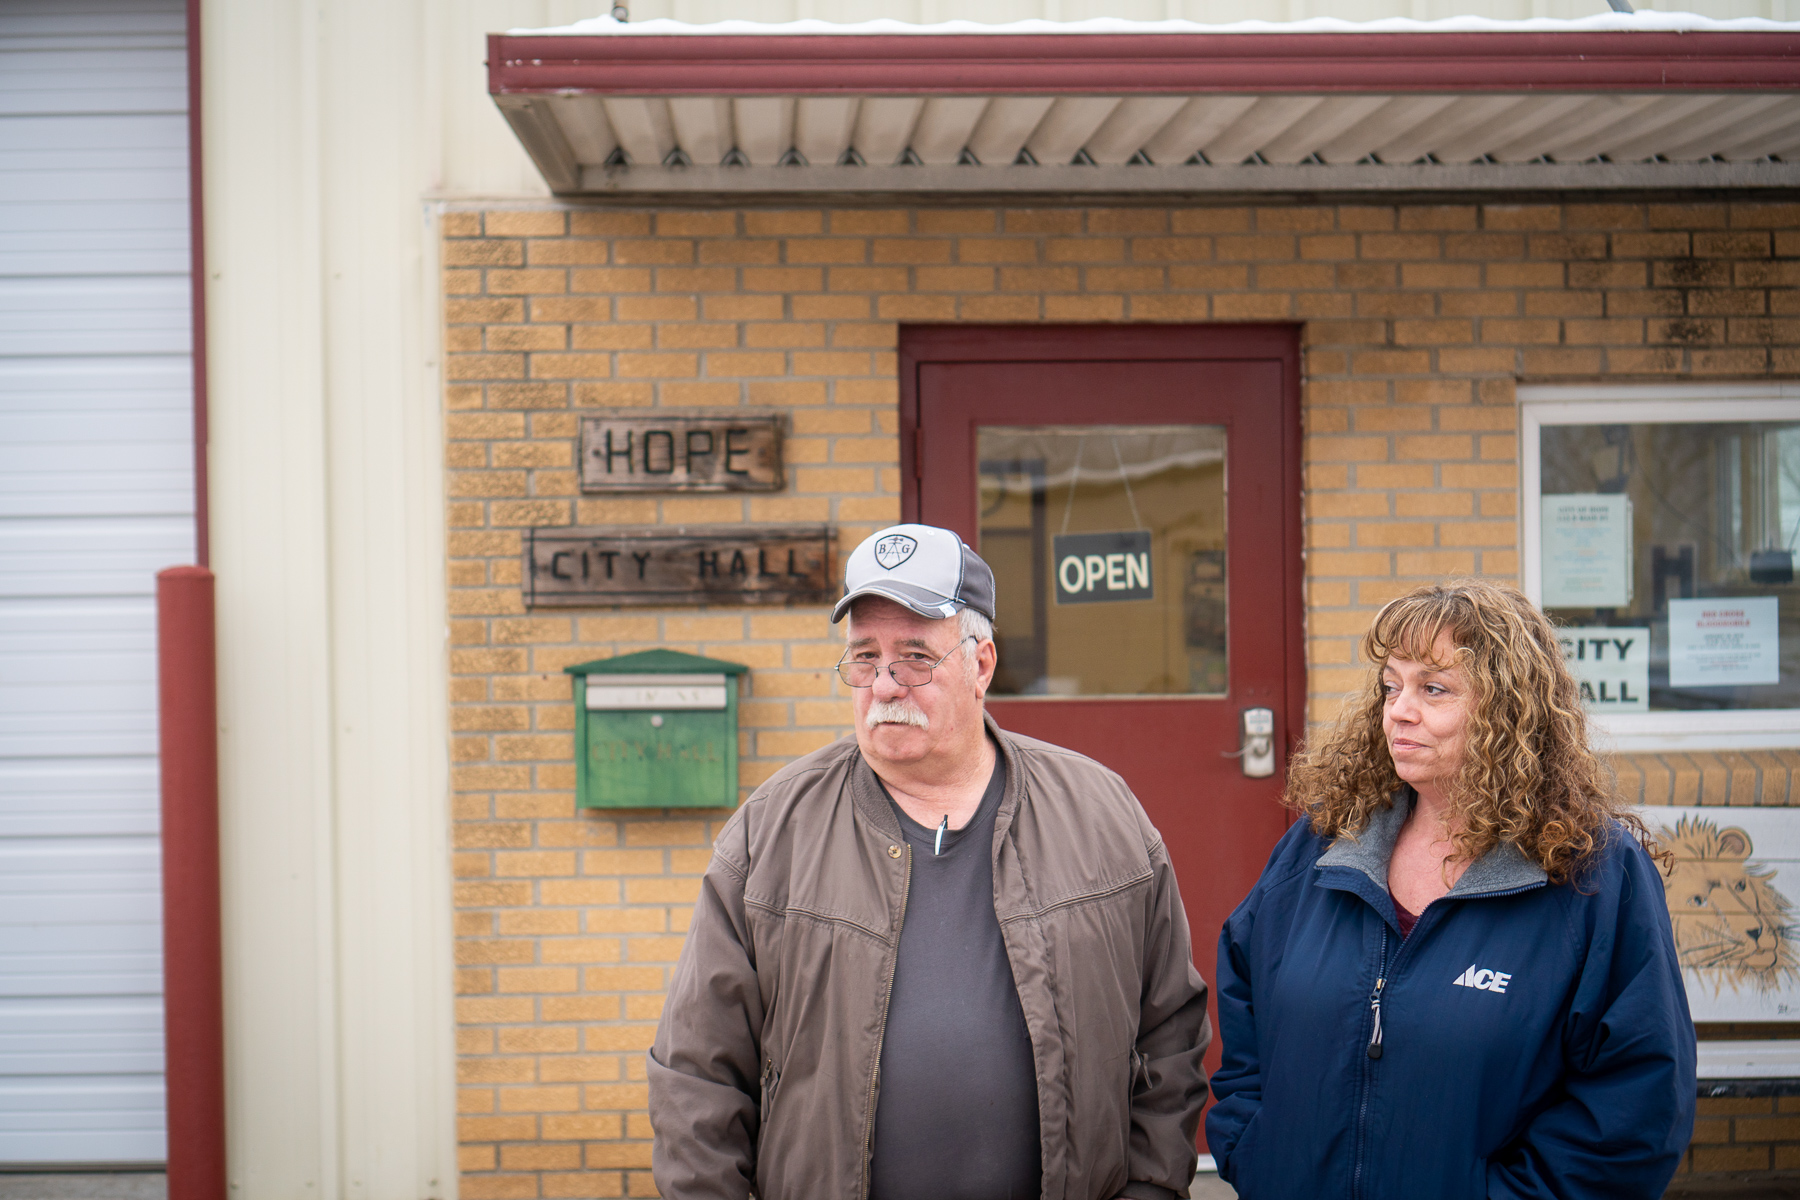 Larry Ryff, Hope Mayor, and City Clerk Joni Rickard outside of Hope's small city hall on January 15, 2019.